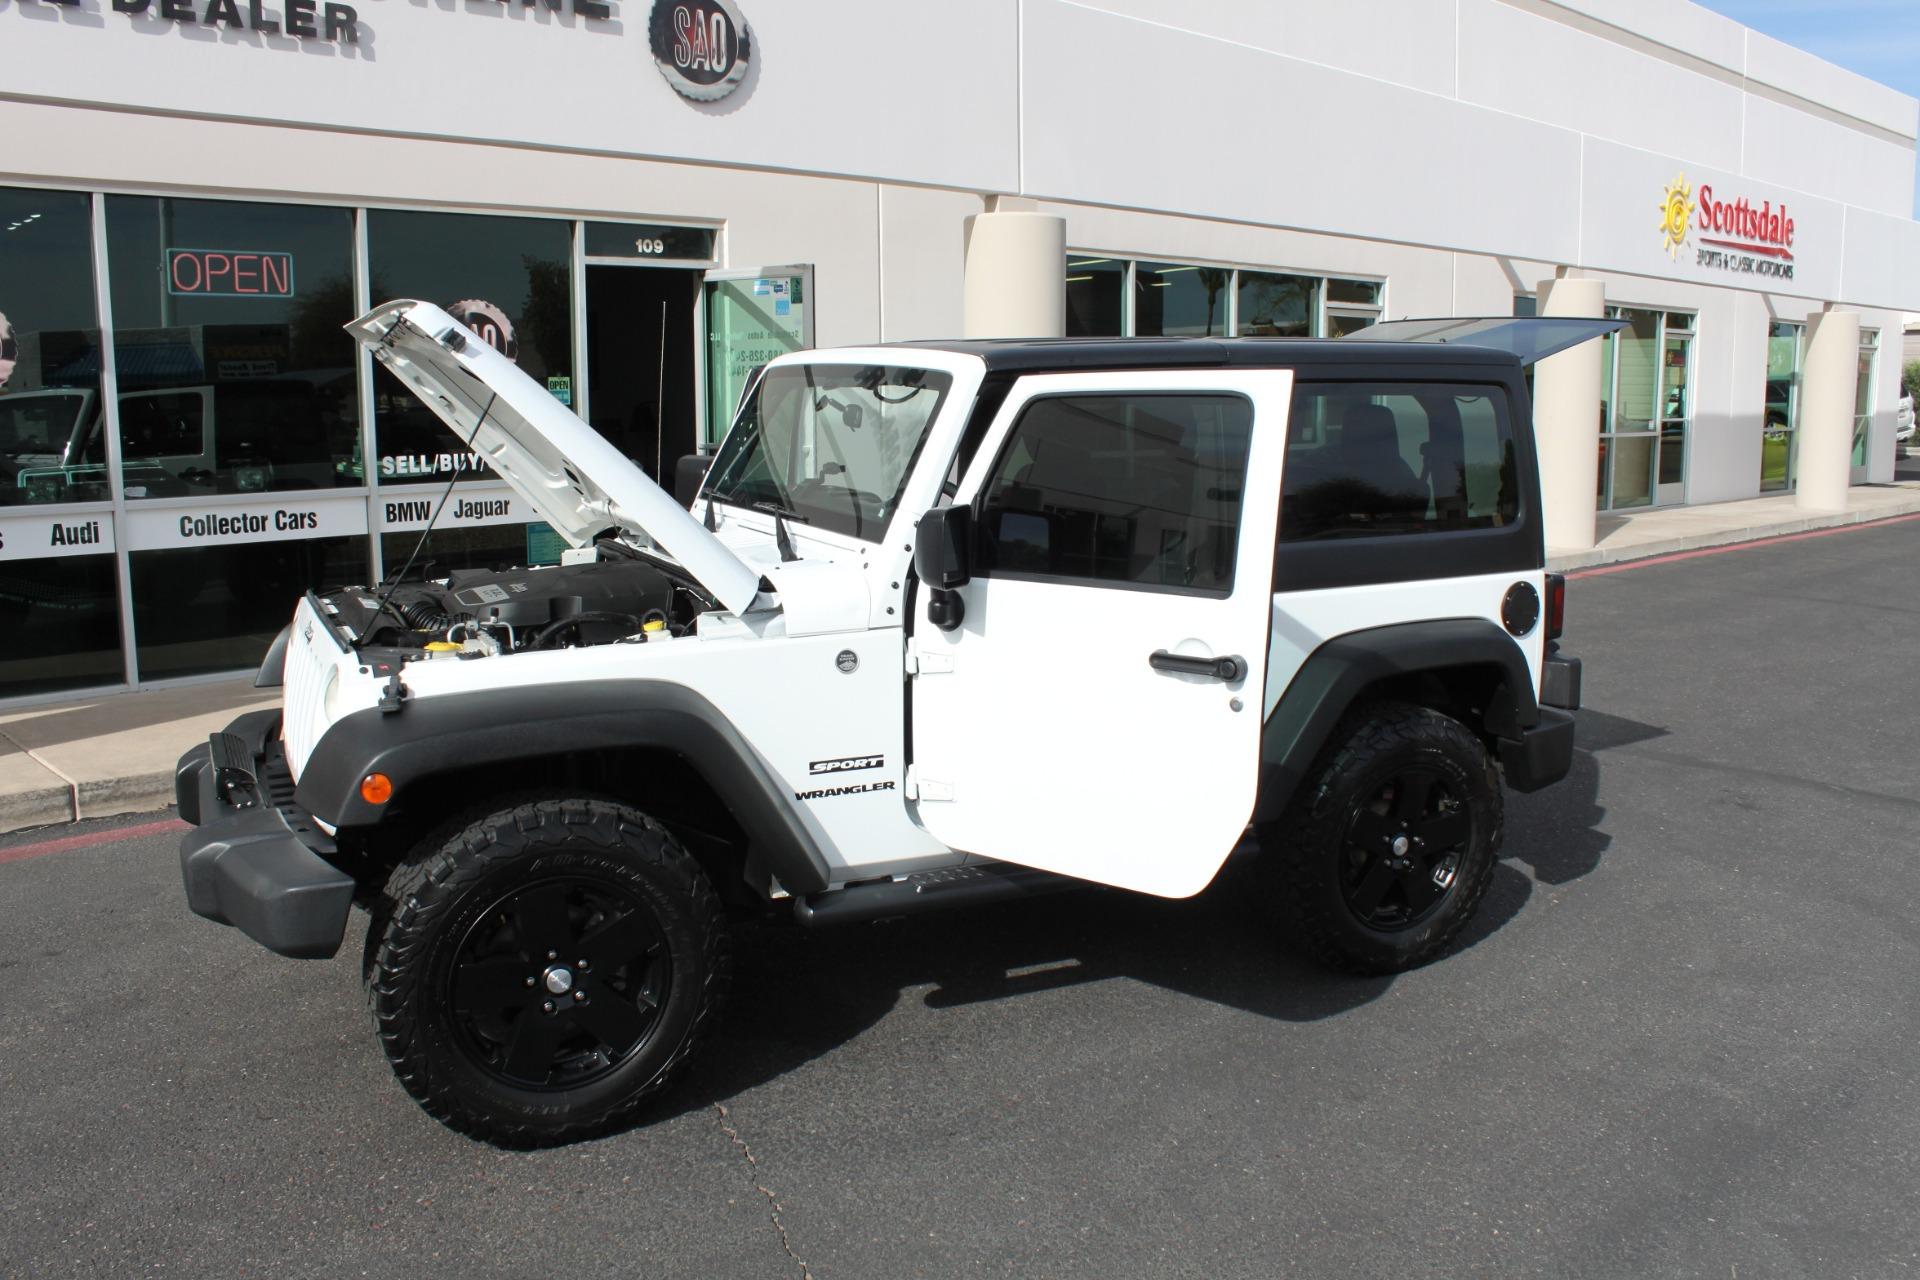 Used-2012-Jeep-Wrangler-Freedom-Edition-4X4-Alfa-Romeo